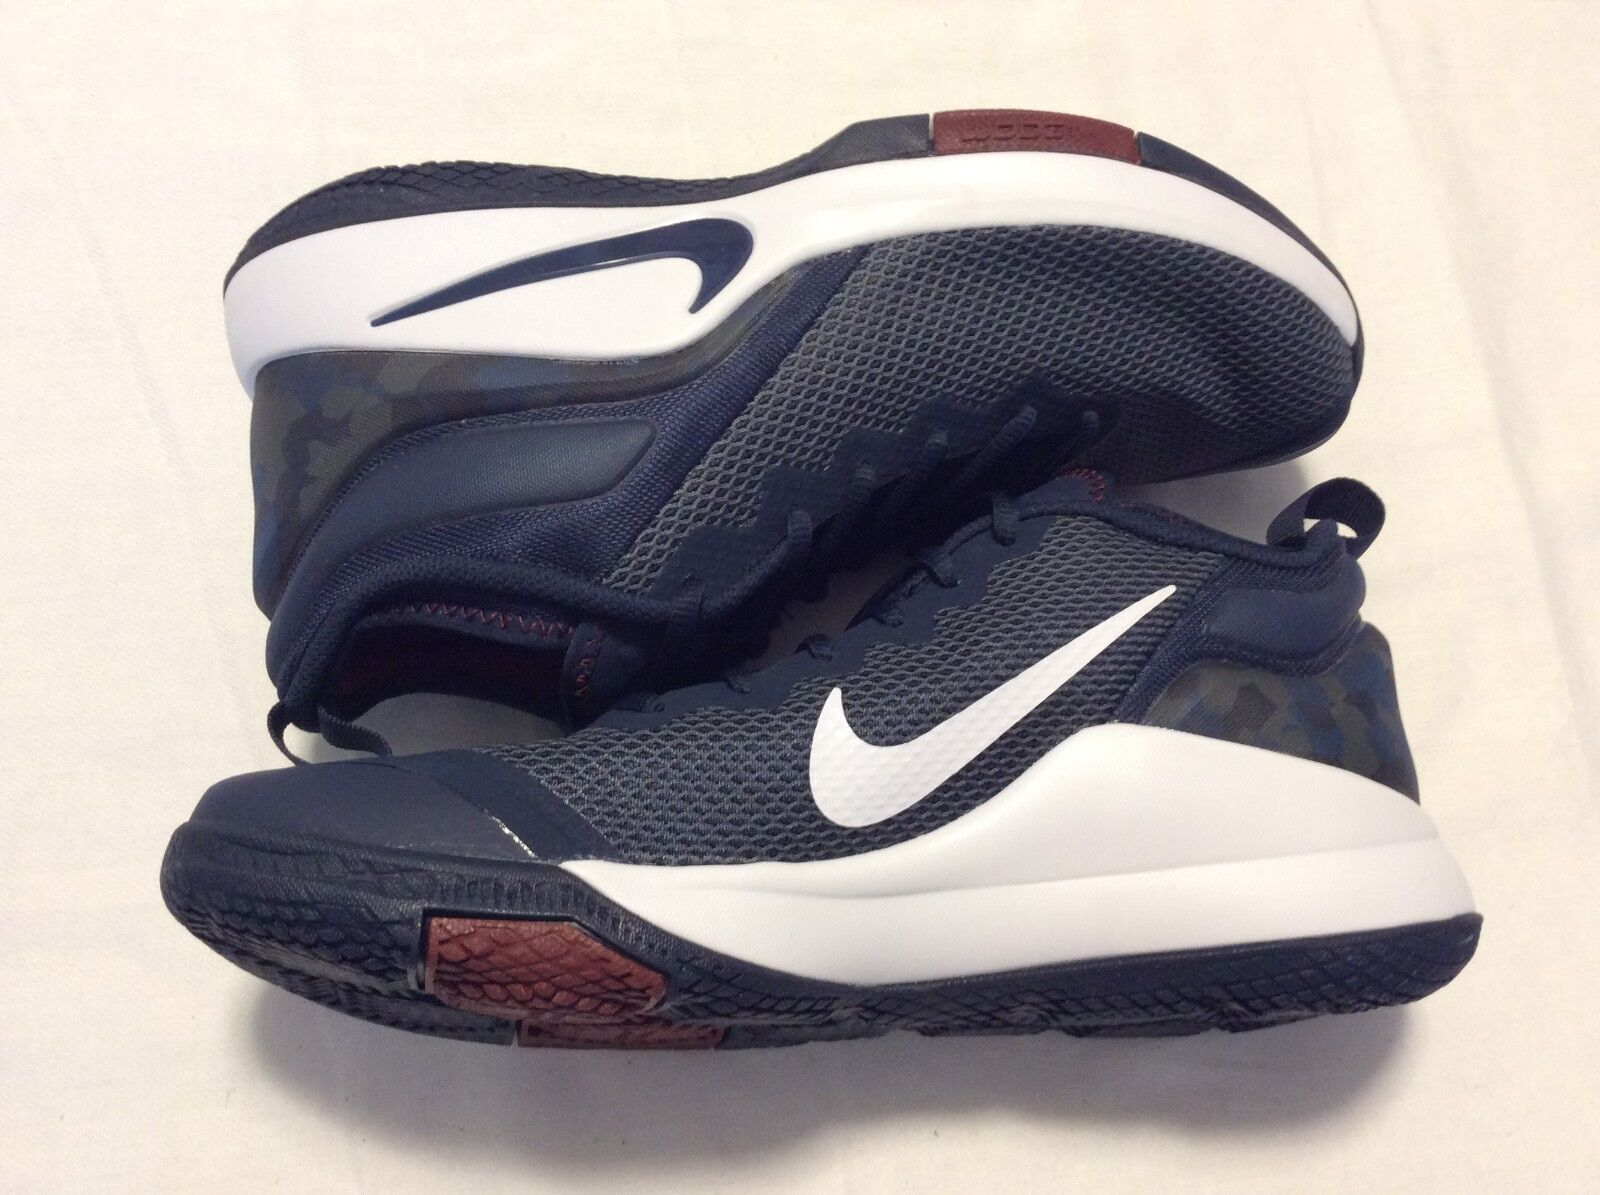 cabd461b641 Nike Lebron Witness II Men Basketball Shoes College Navy White ...